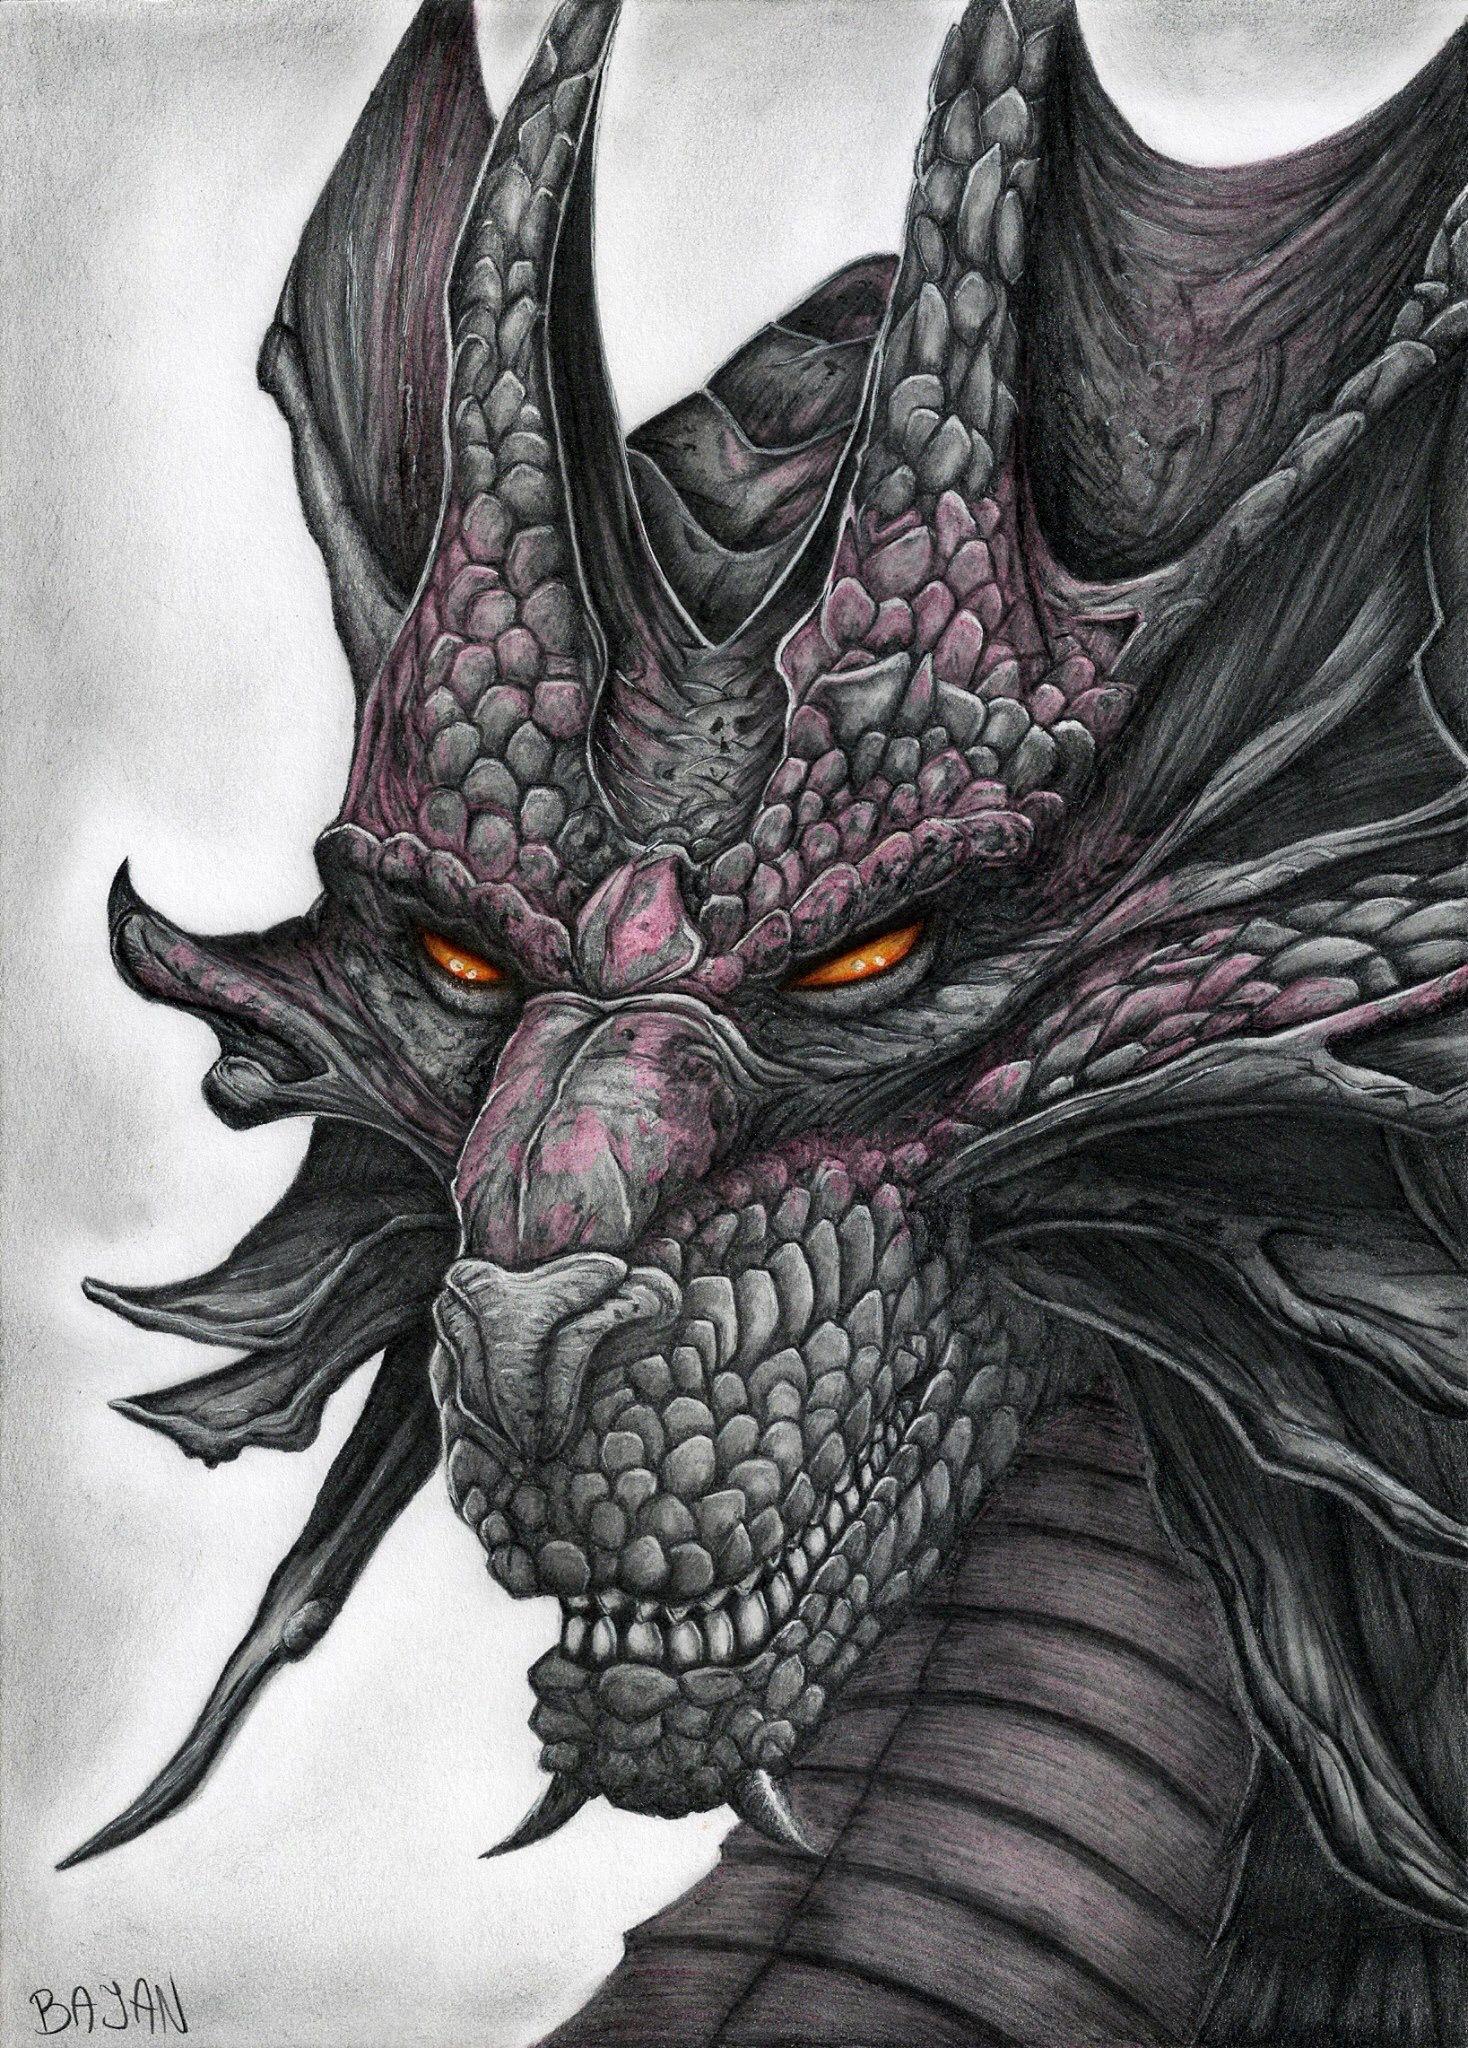 Moon goddess moon goddess strong women fantasy dragons dragon